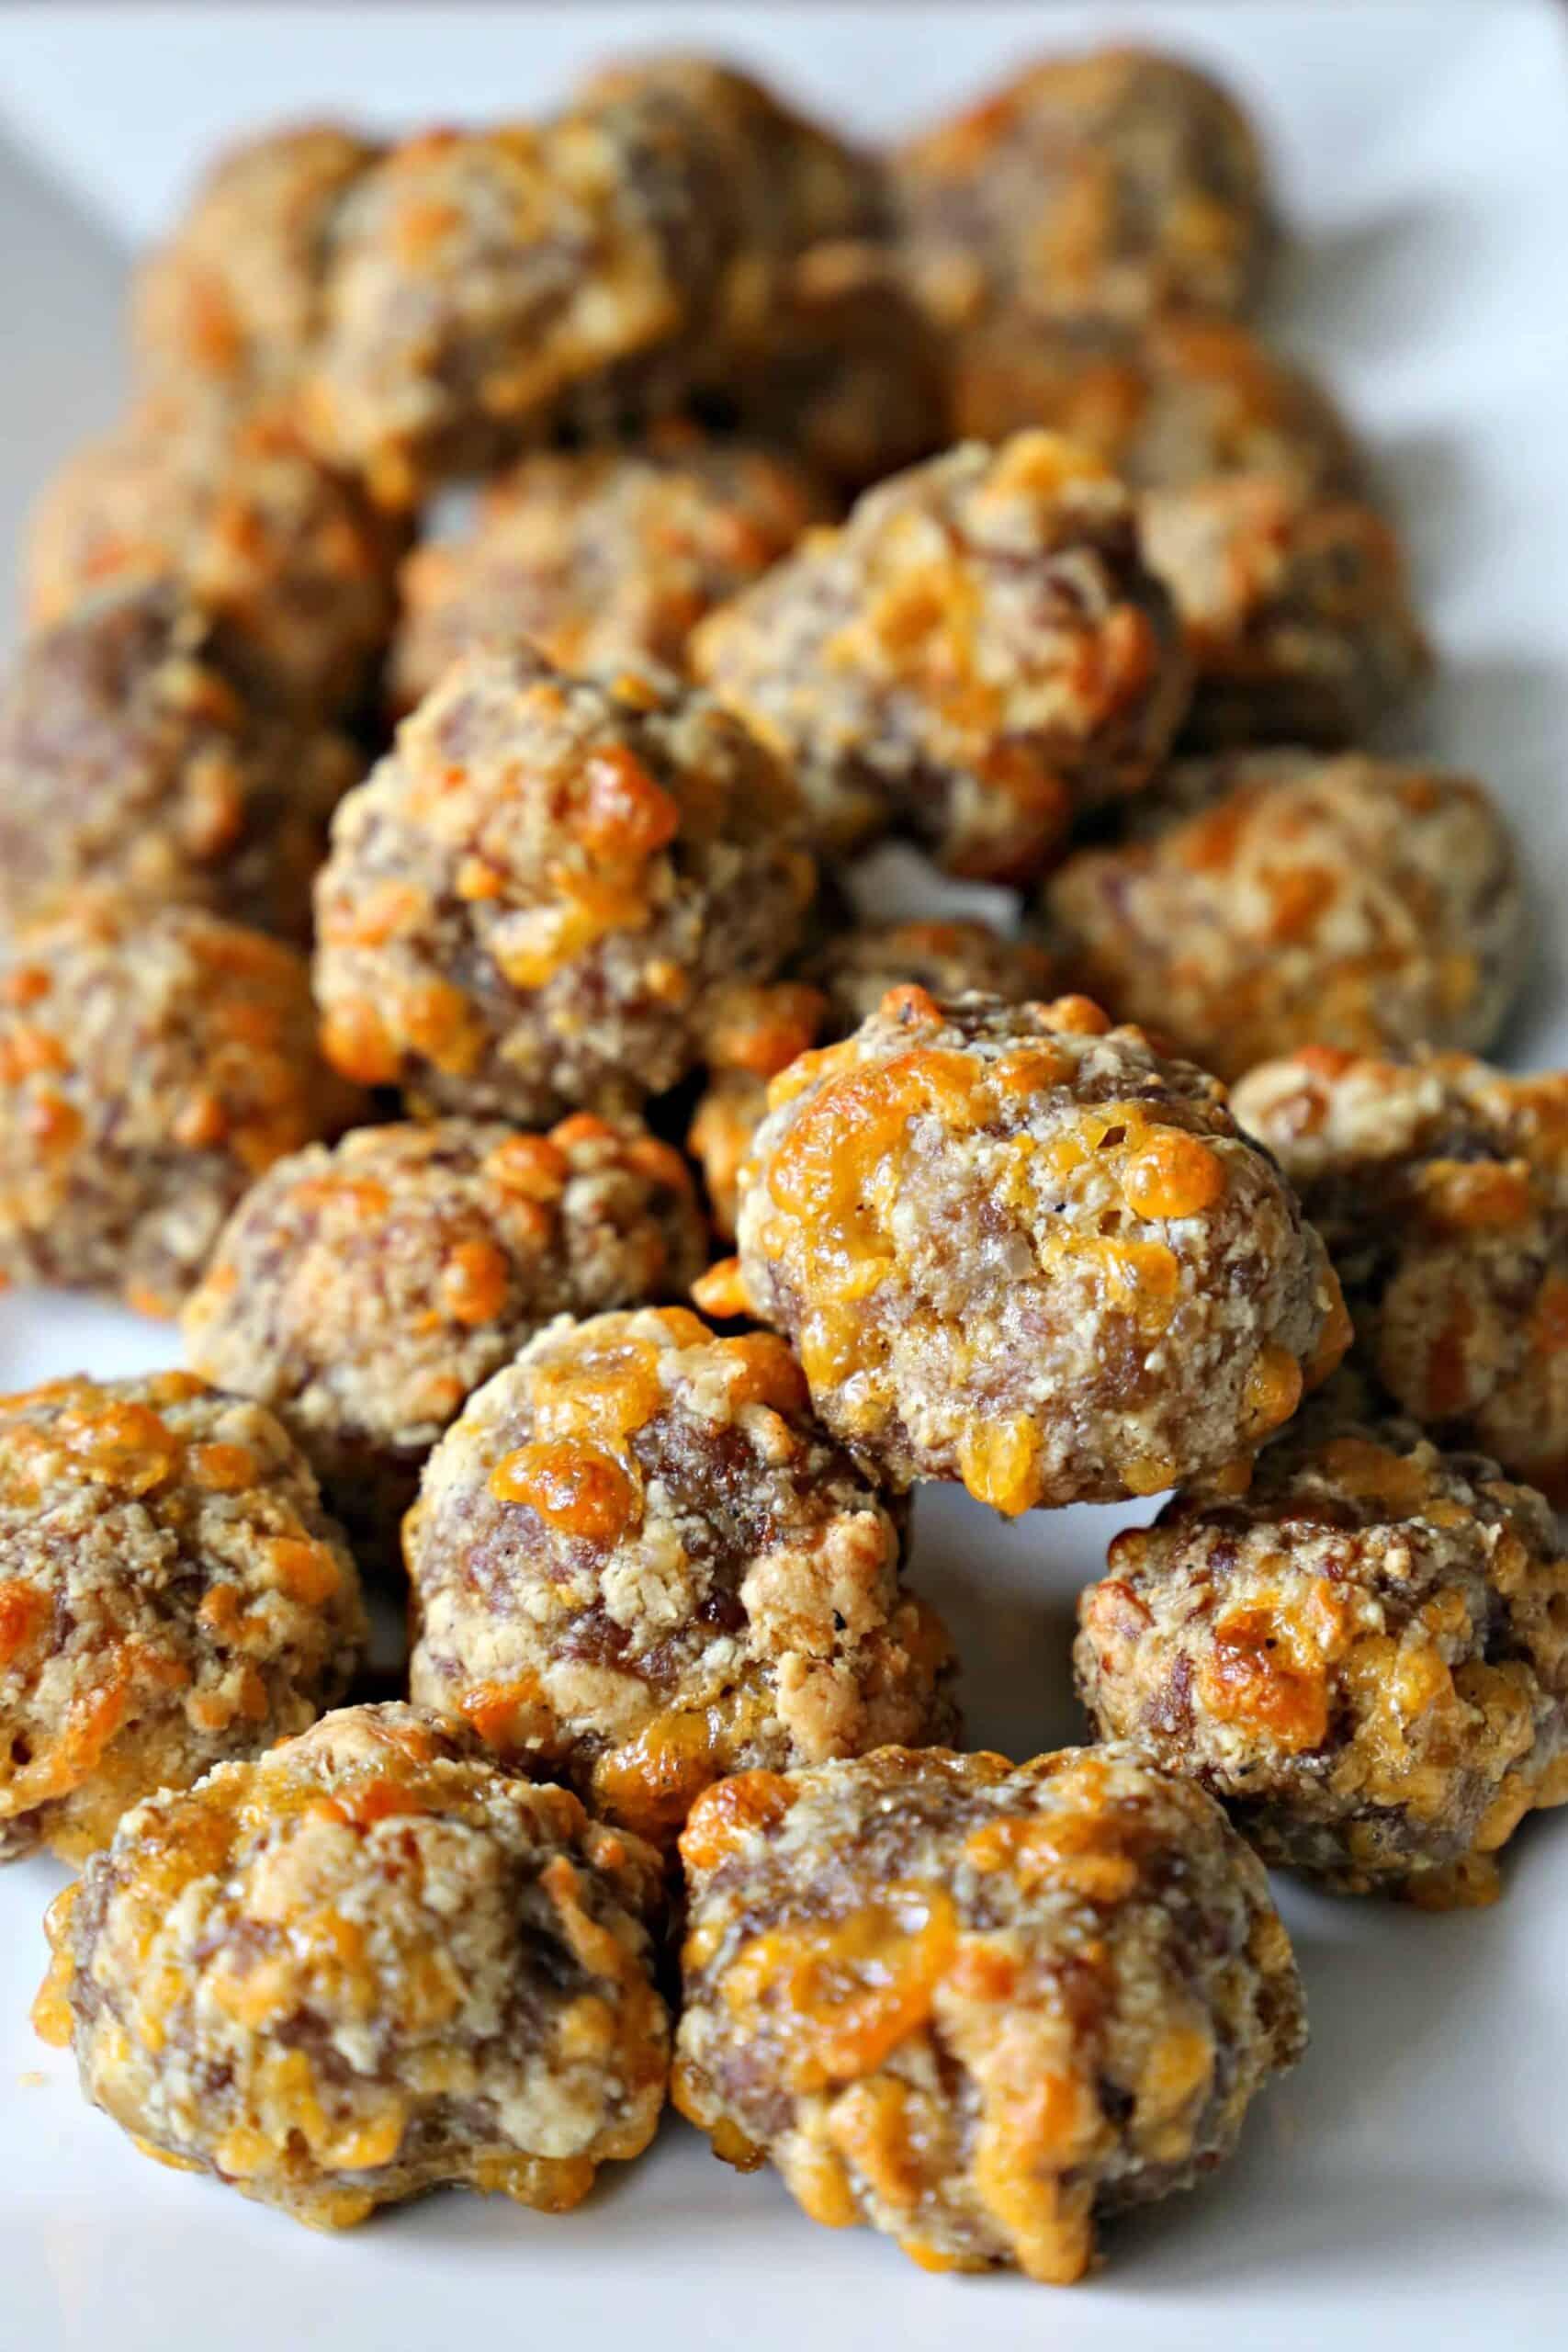 plate of sausage balls